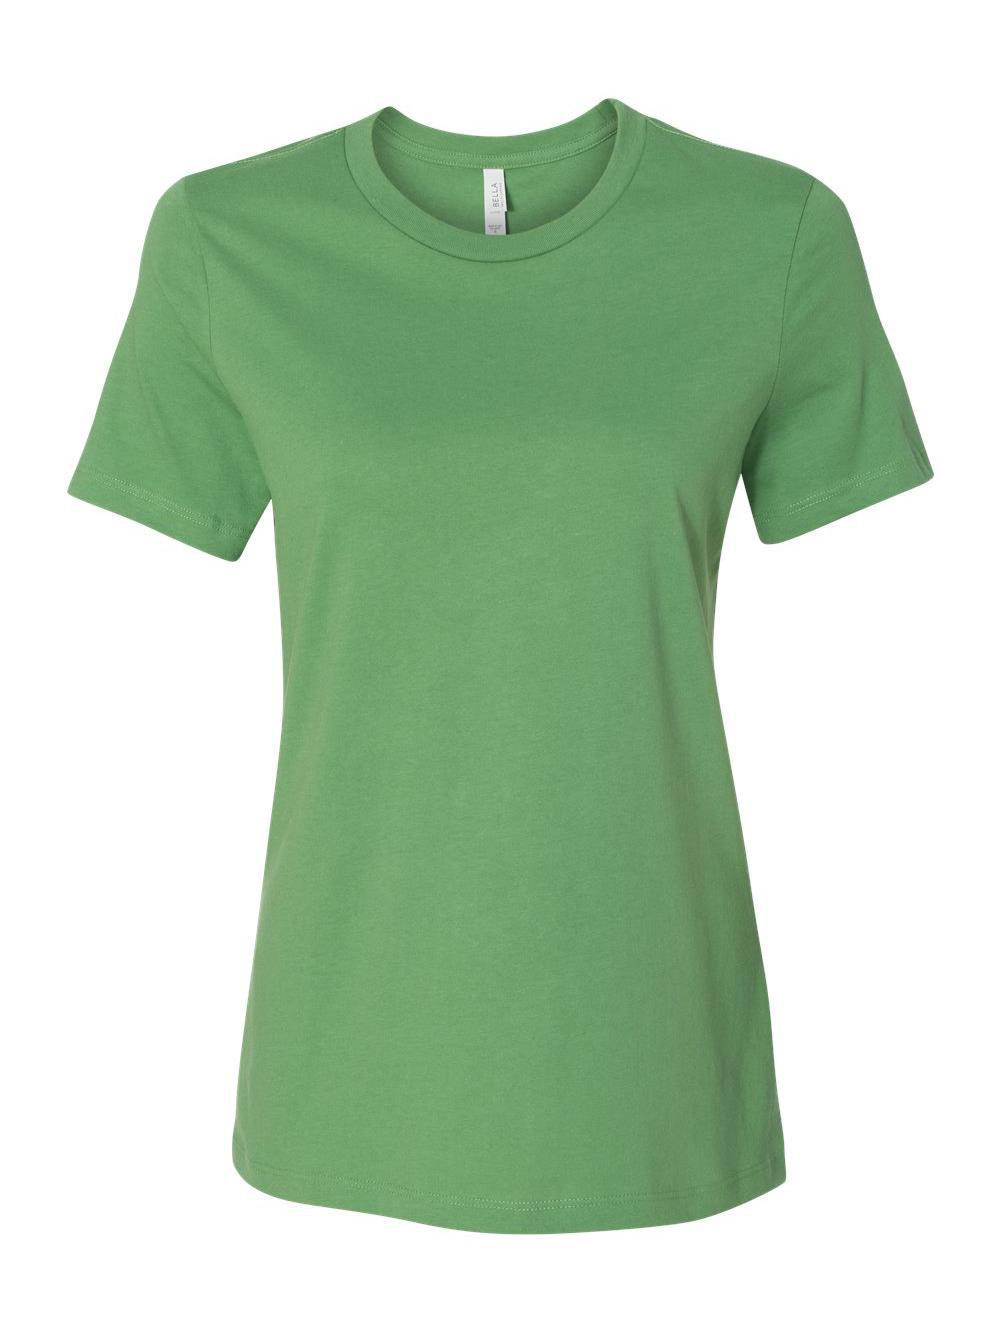 Bella-Canvas-Women-039-s-Relaxed-Short-Sleeve-Jersey-Tee-6400 thumbnail 45